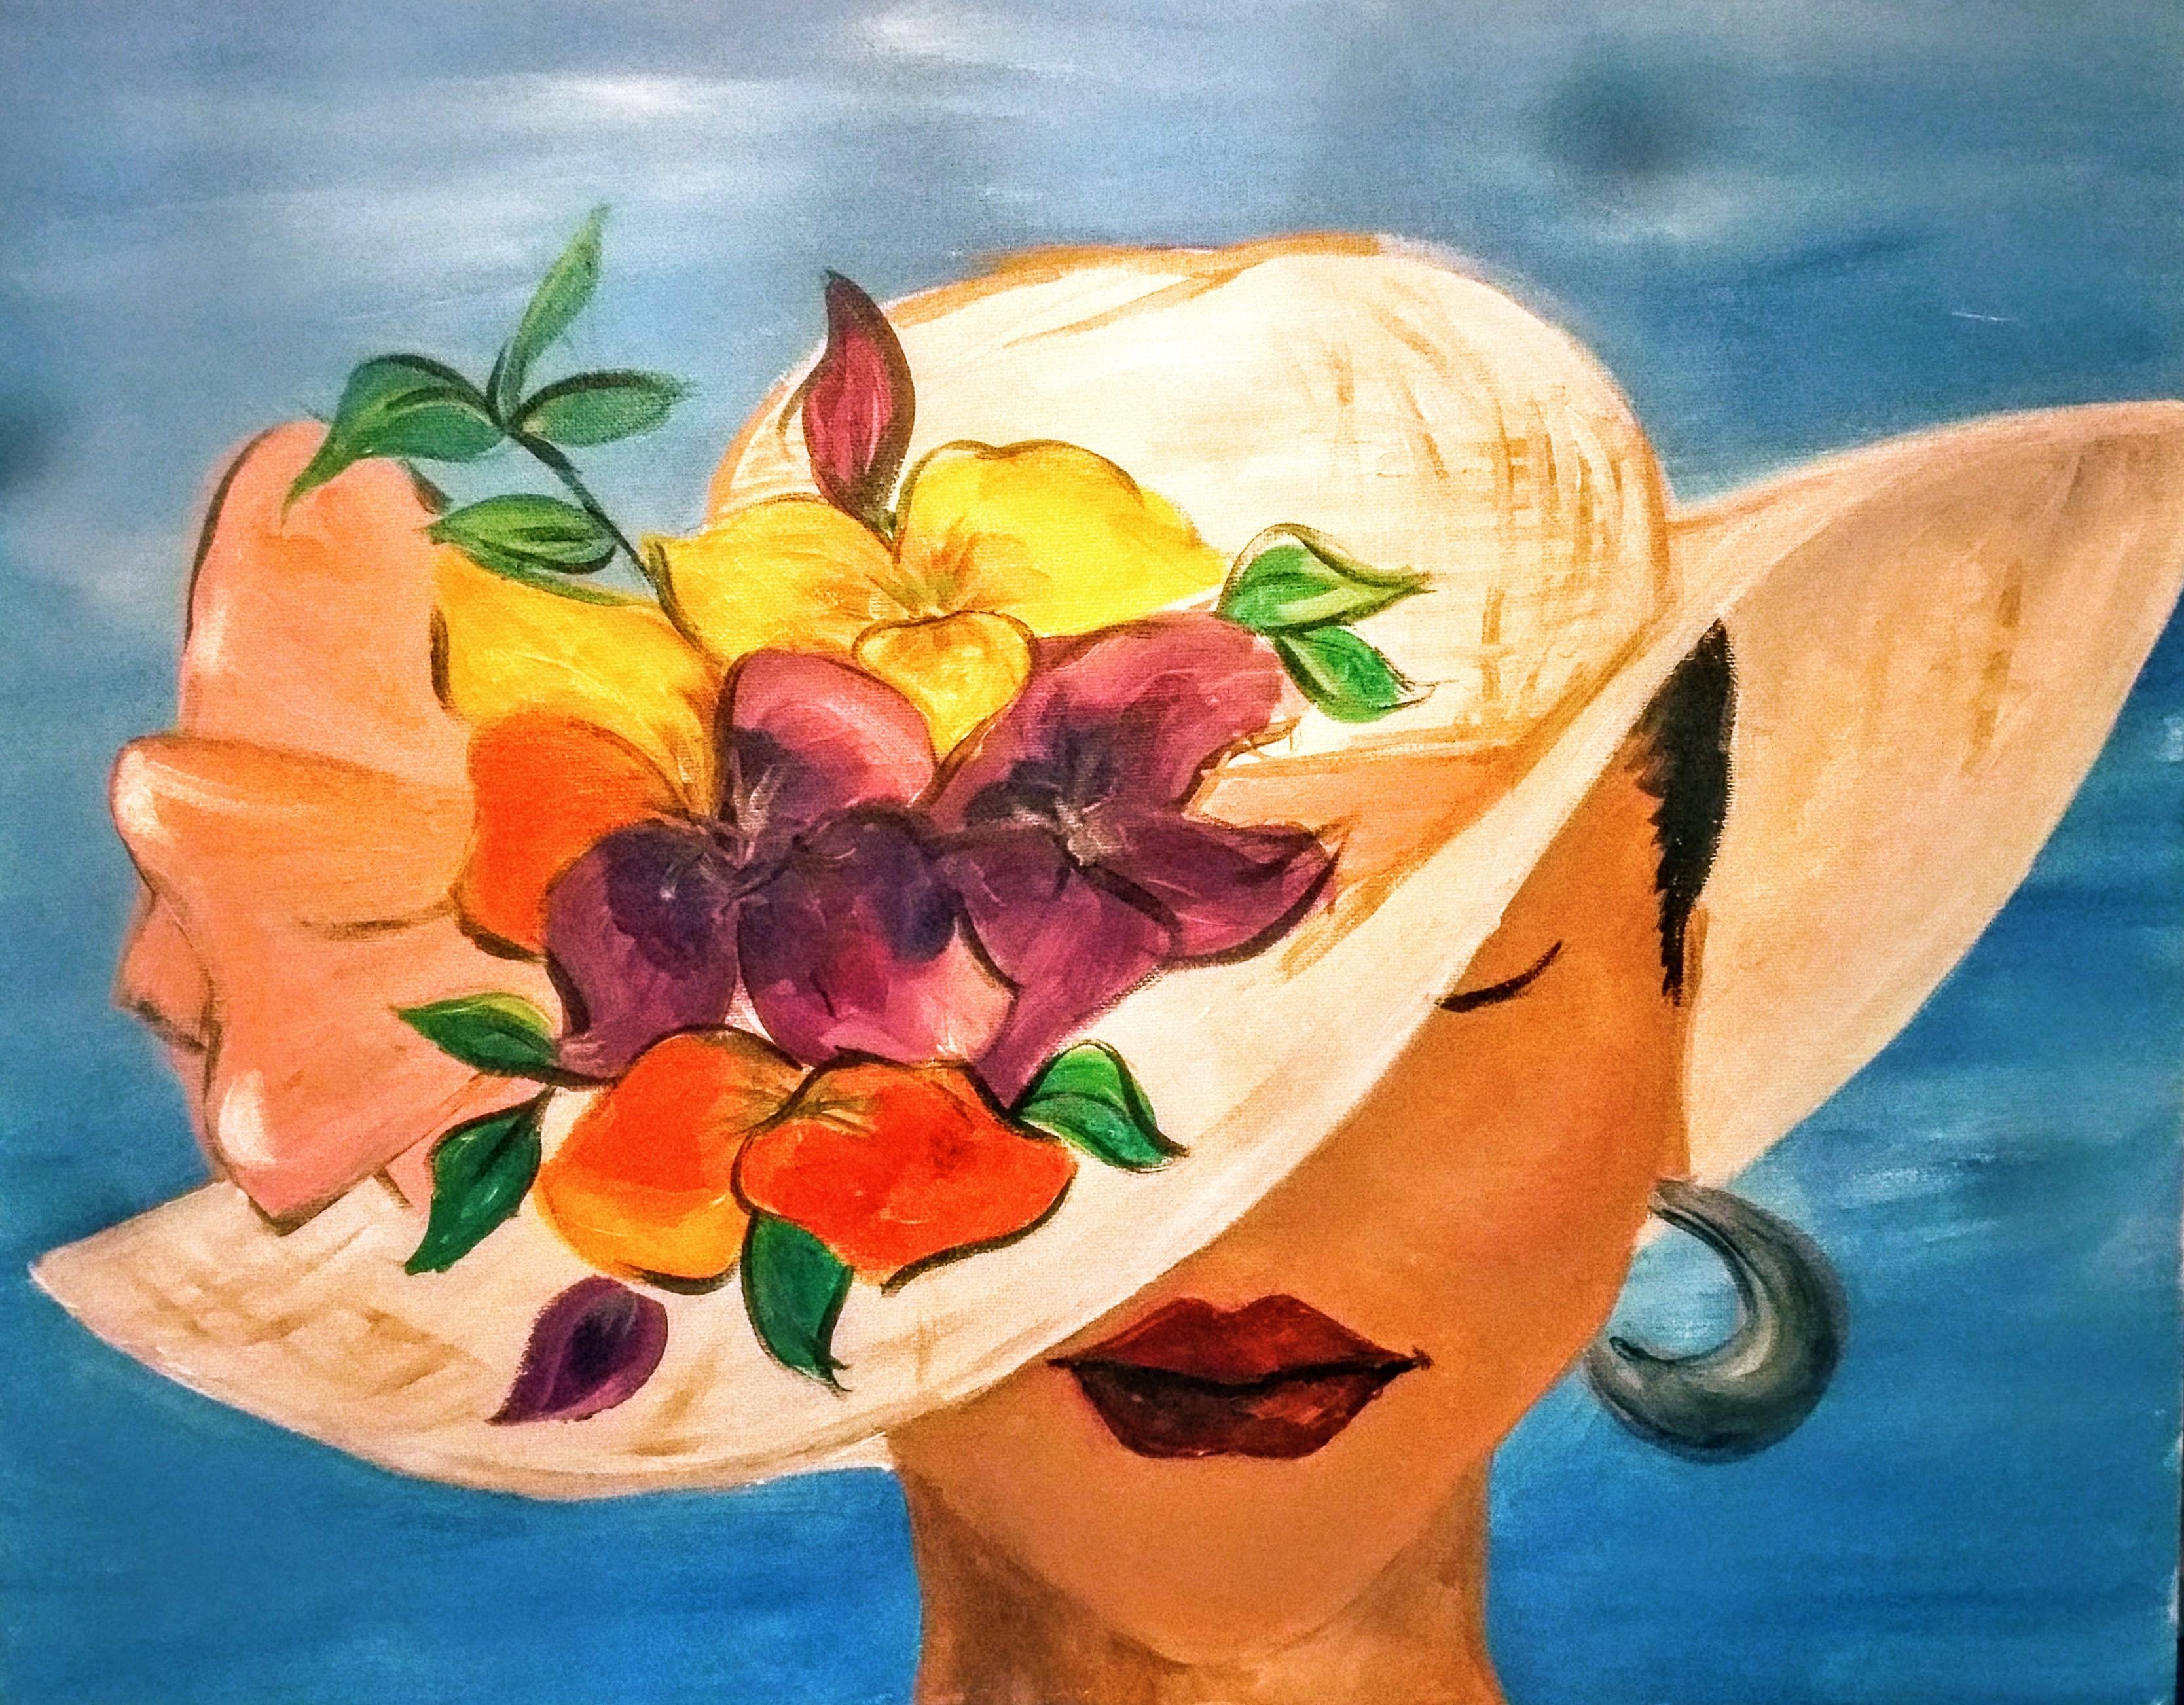 Artistik Flows Spring Fling Paint & Sip Fundr